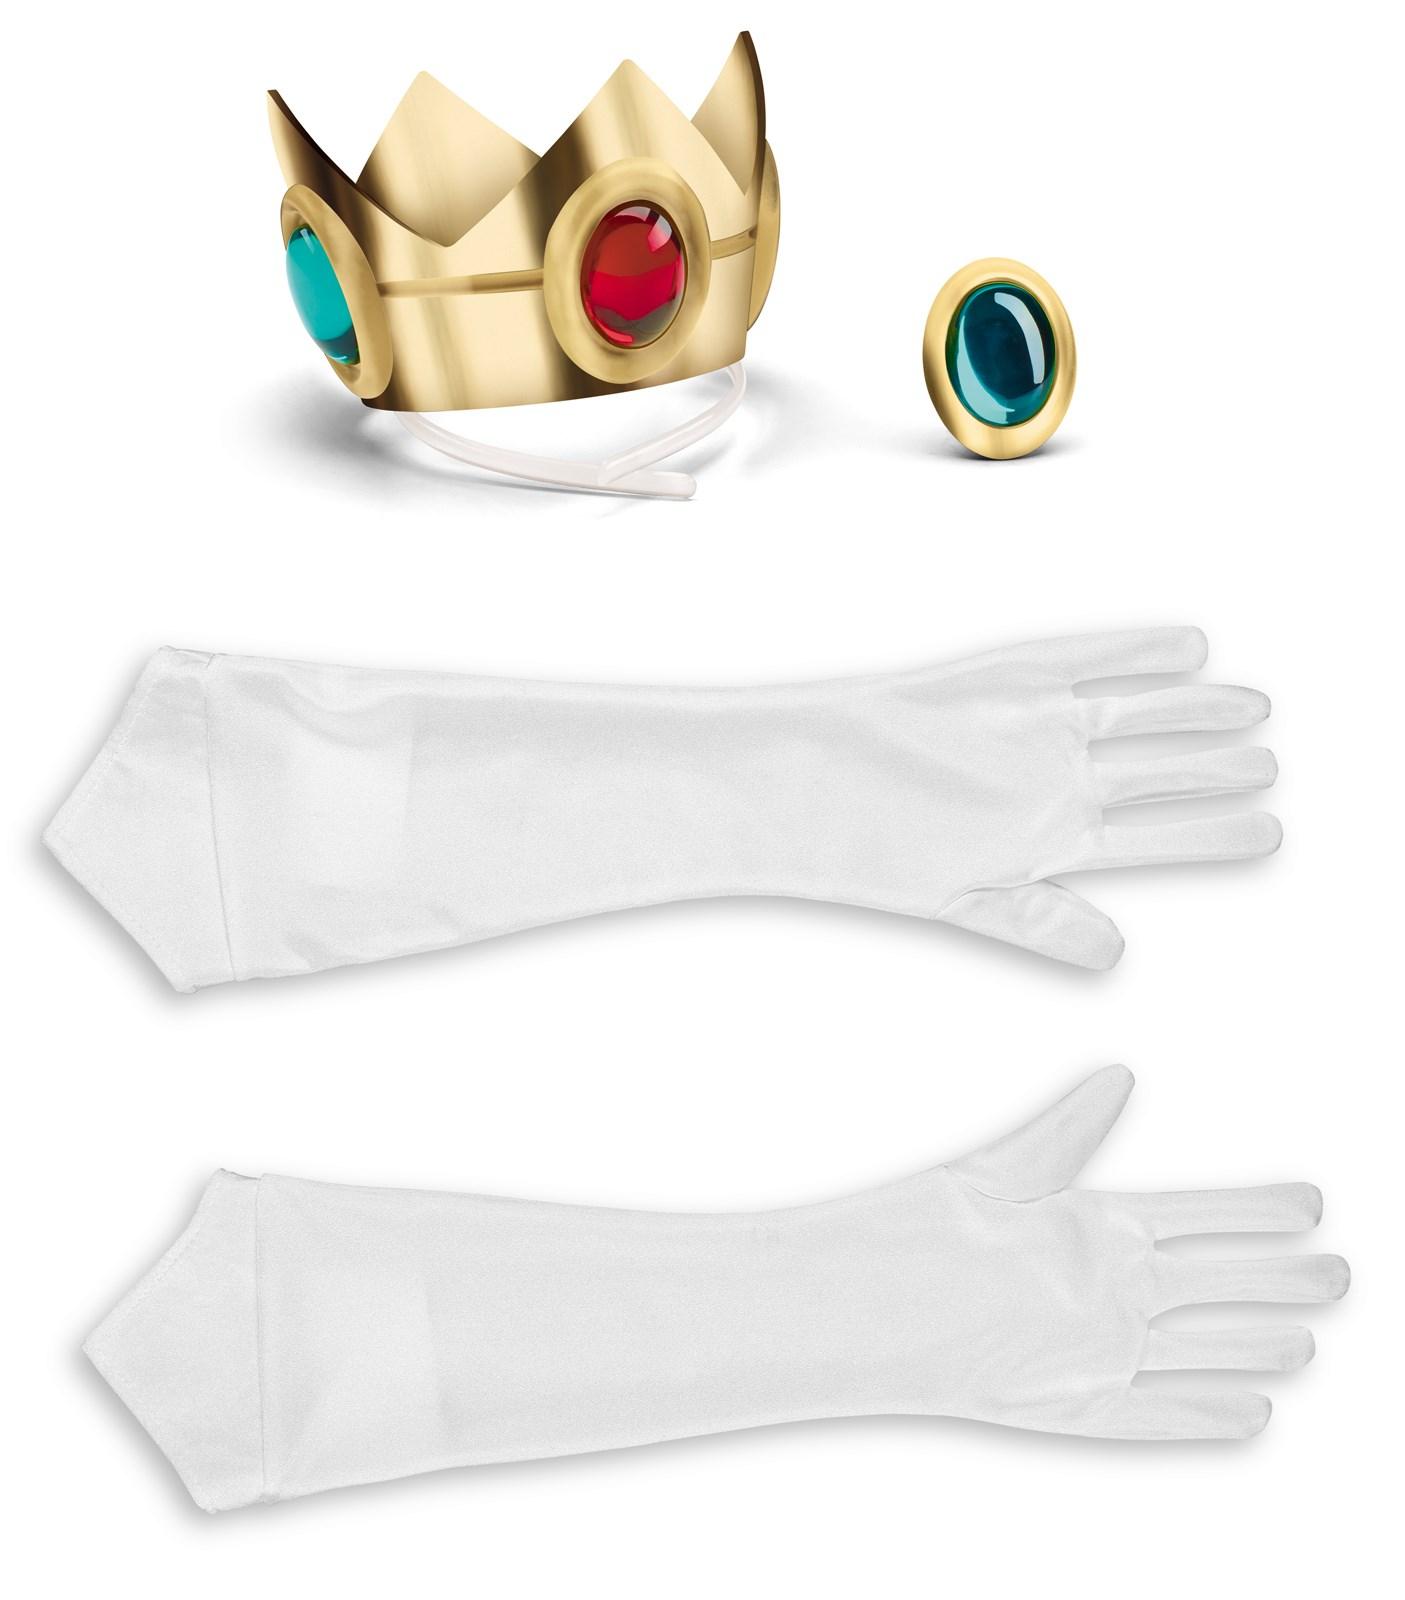 Super Mario Brothers - Princess Peach Accessory Kit